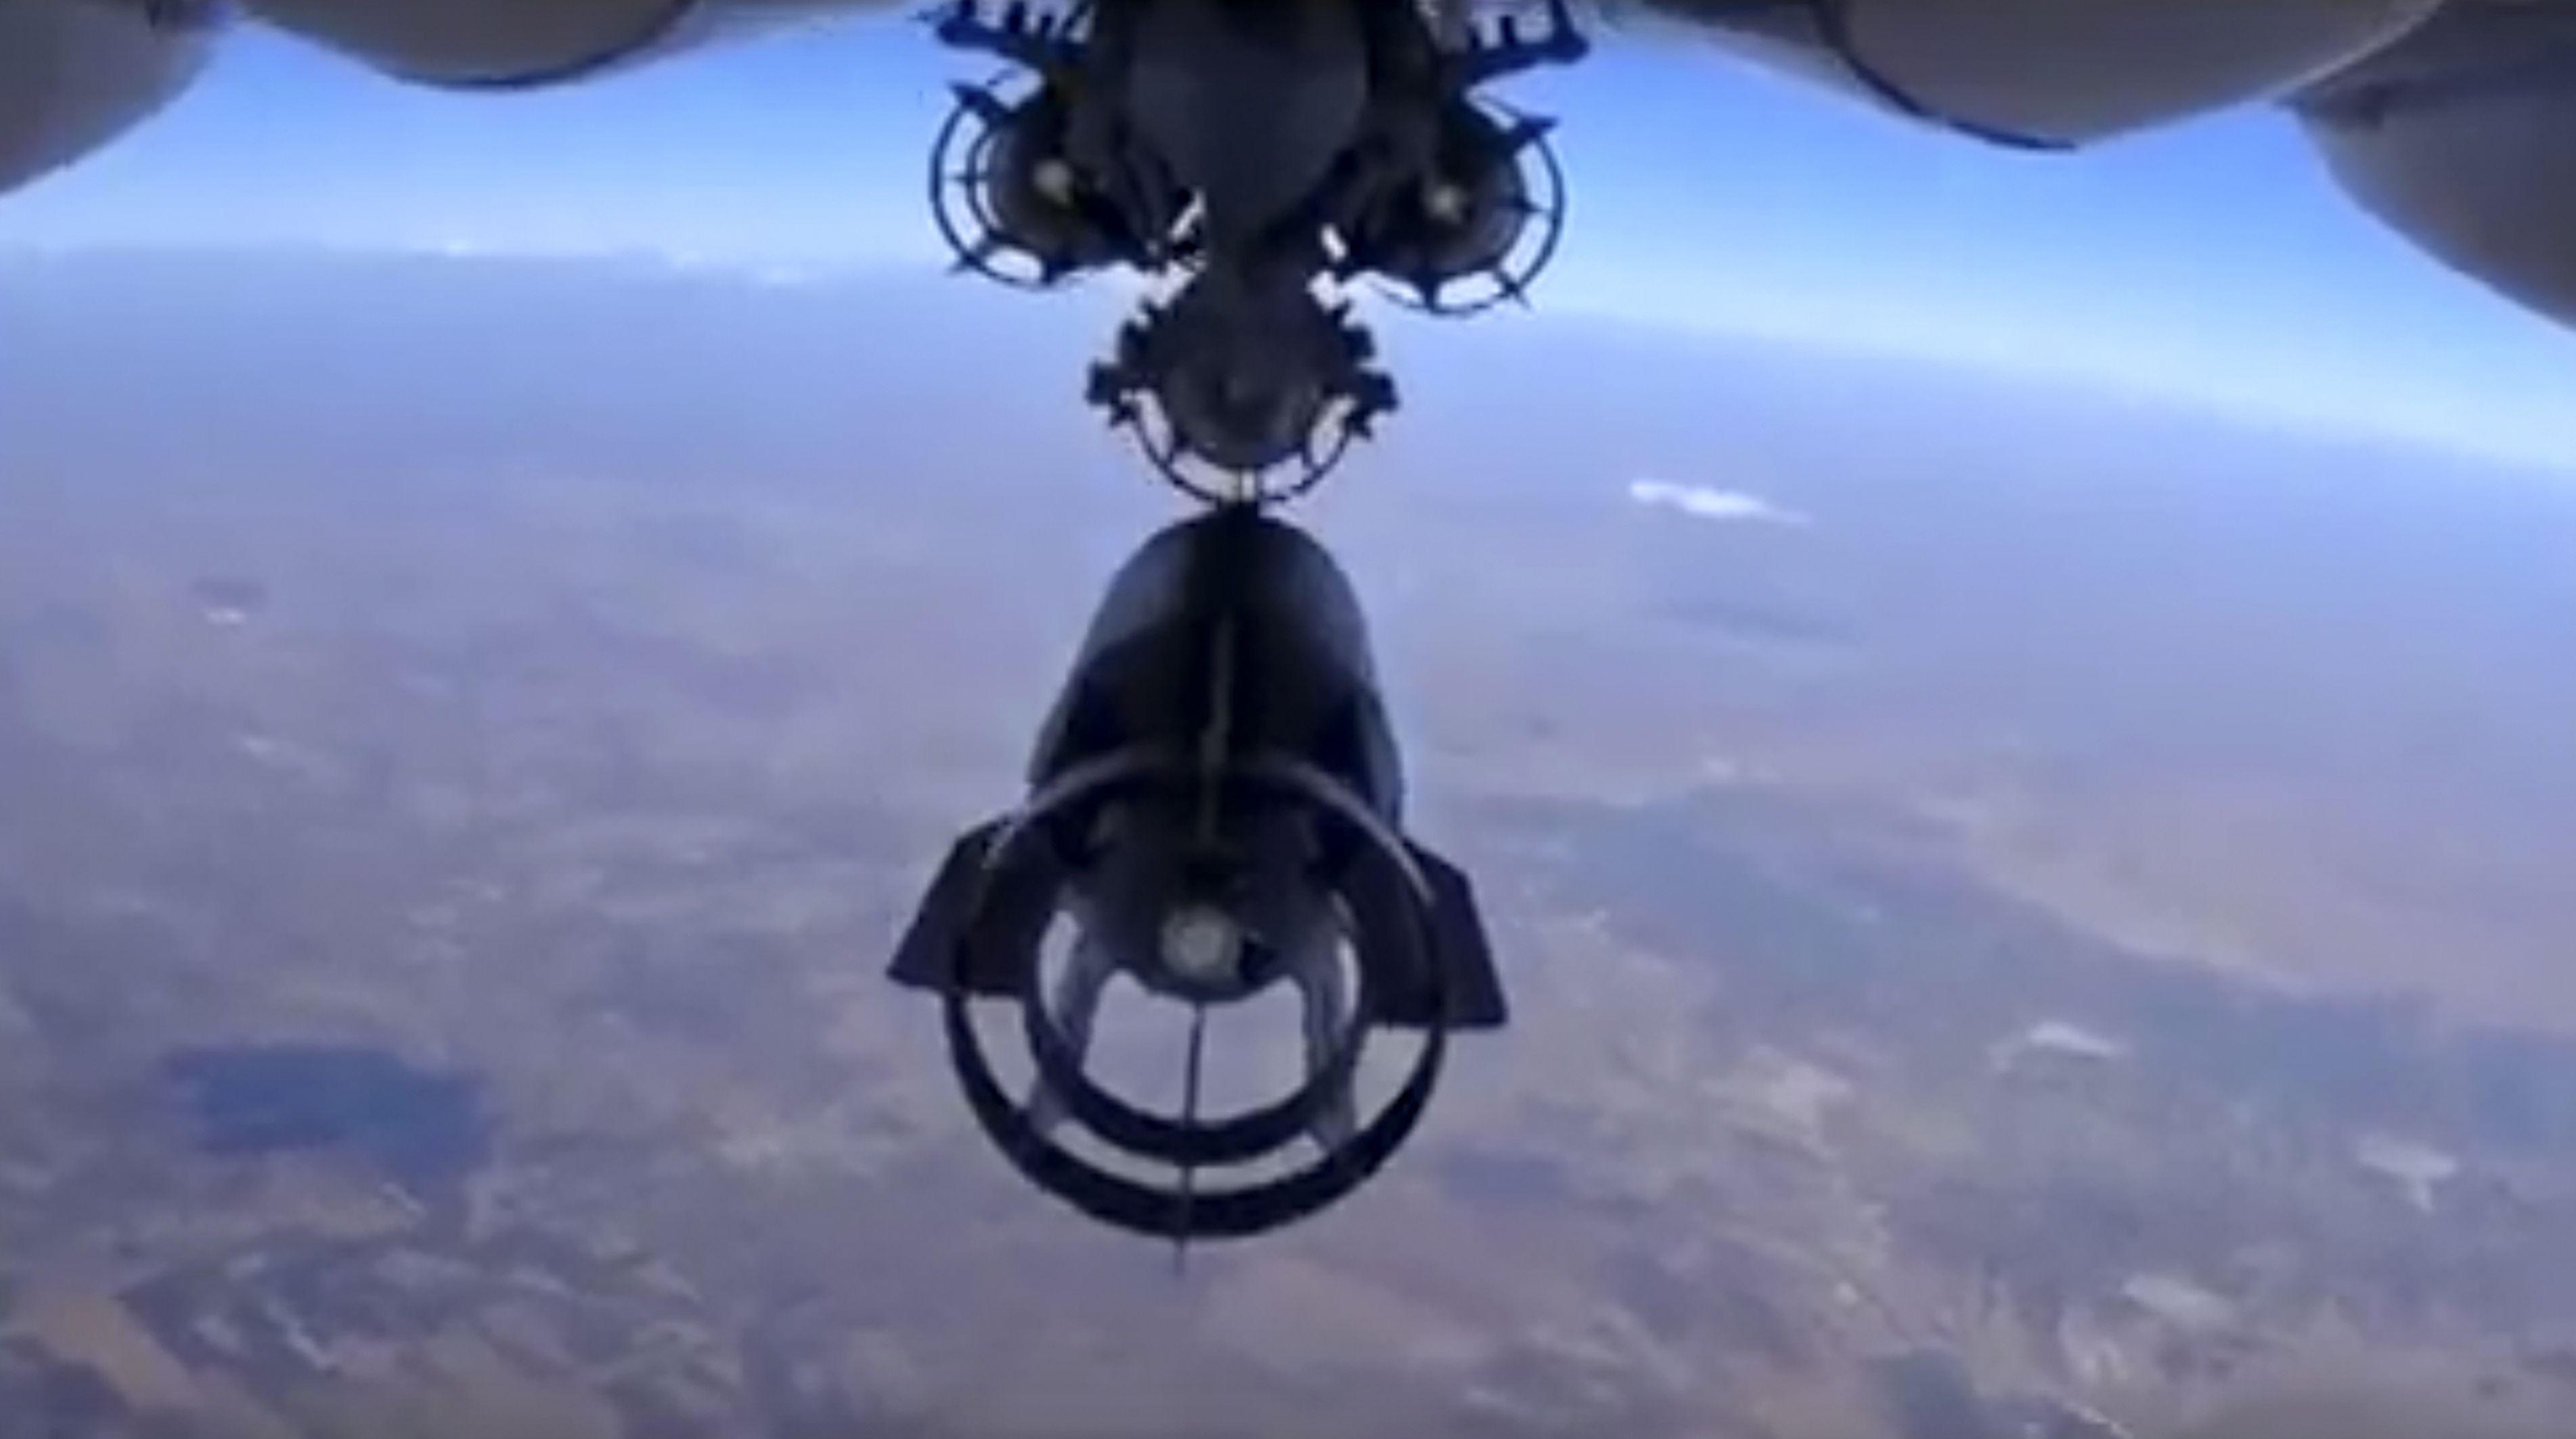 Ofensiva. Imagen de un bombardeo sobre Siria